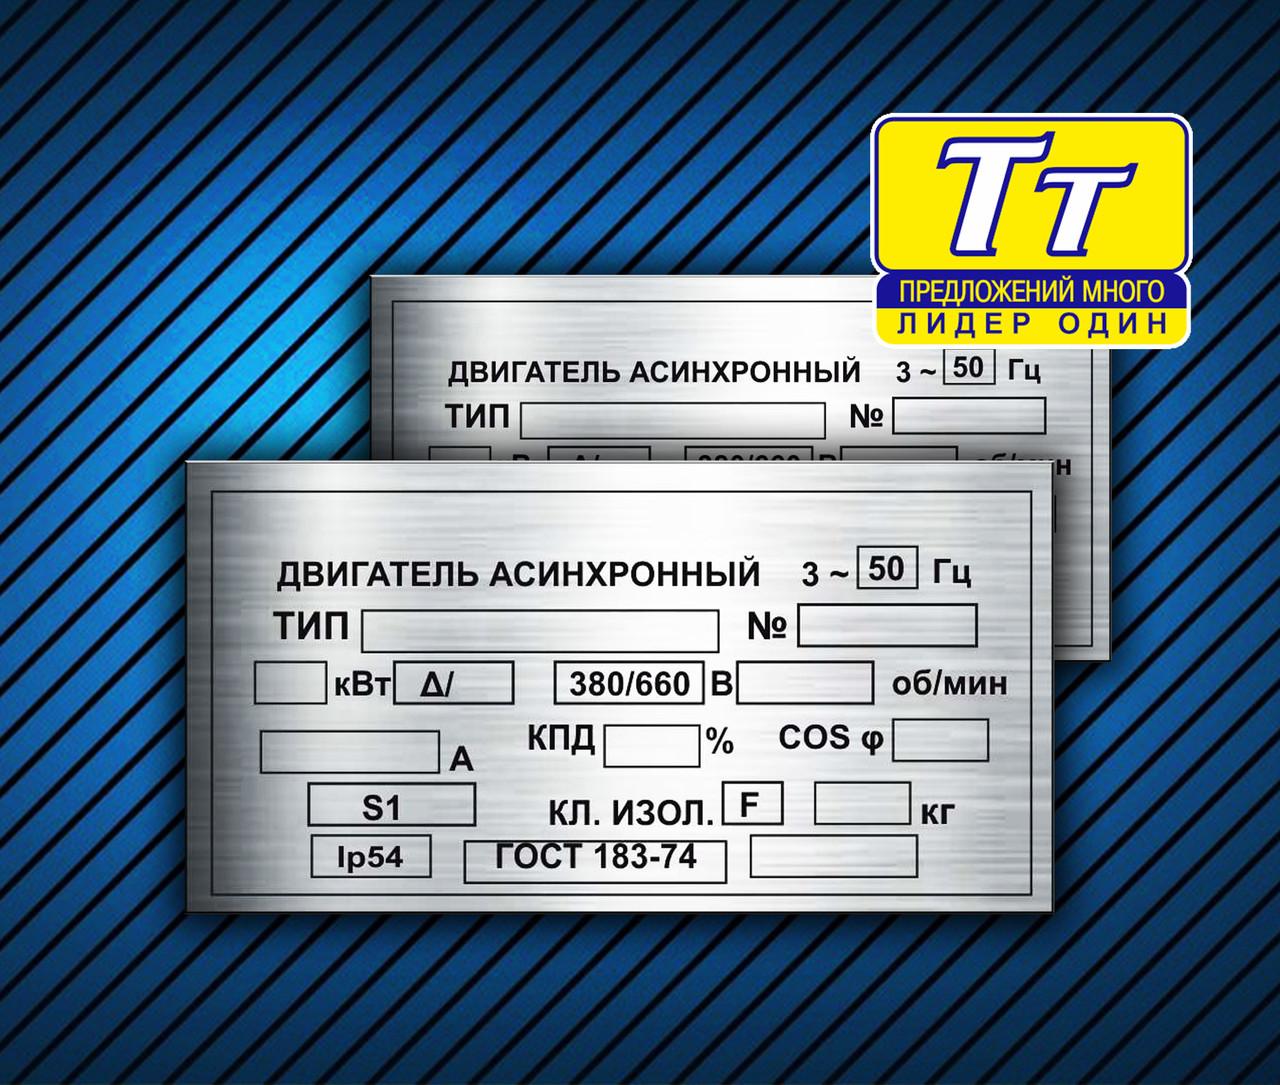 Таблички на теплообменниках Пластинчатый теплообменник Sondex S62 (пищевой теплообменник) Пушкин